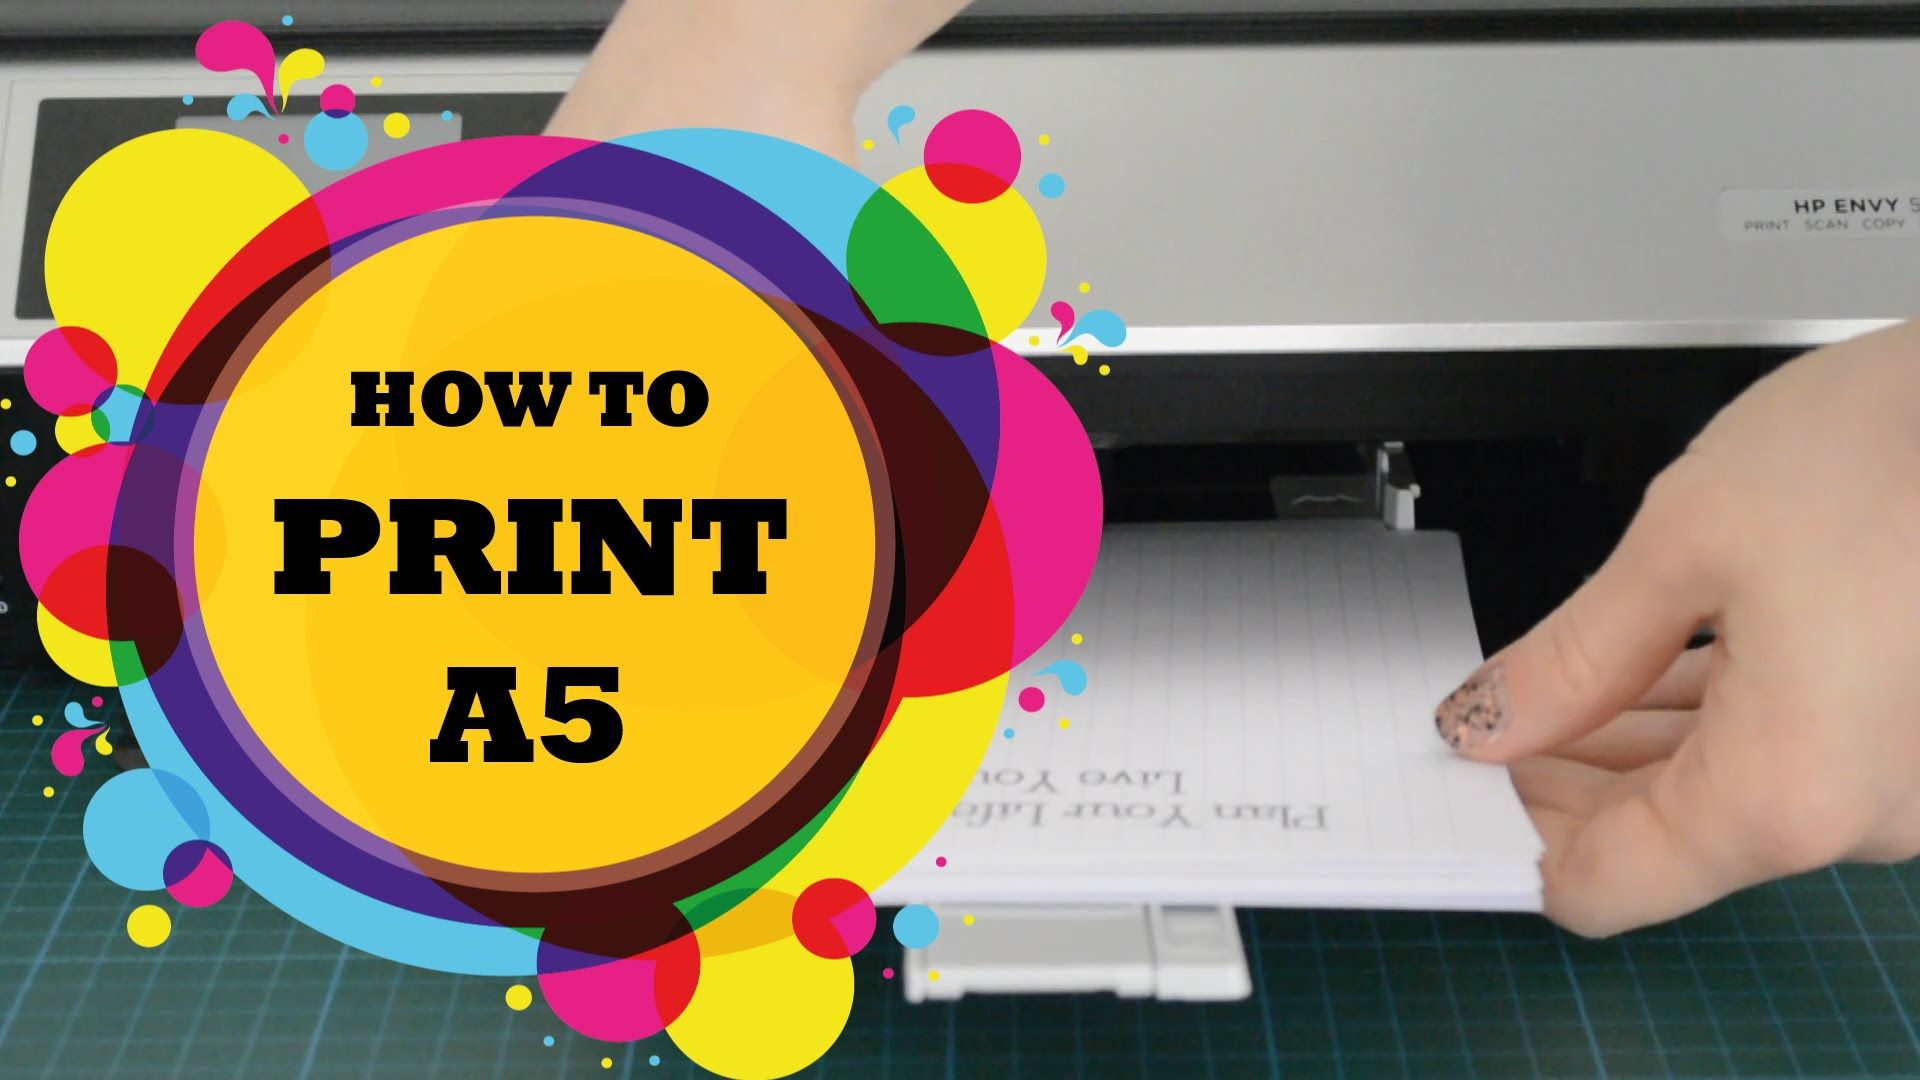 How To Print A5 Filofax Inserts Or Kikki K Planner Inserts